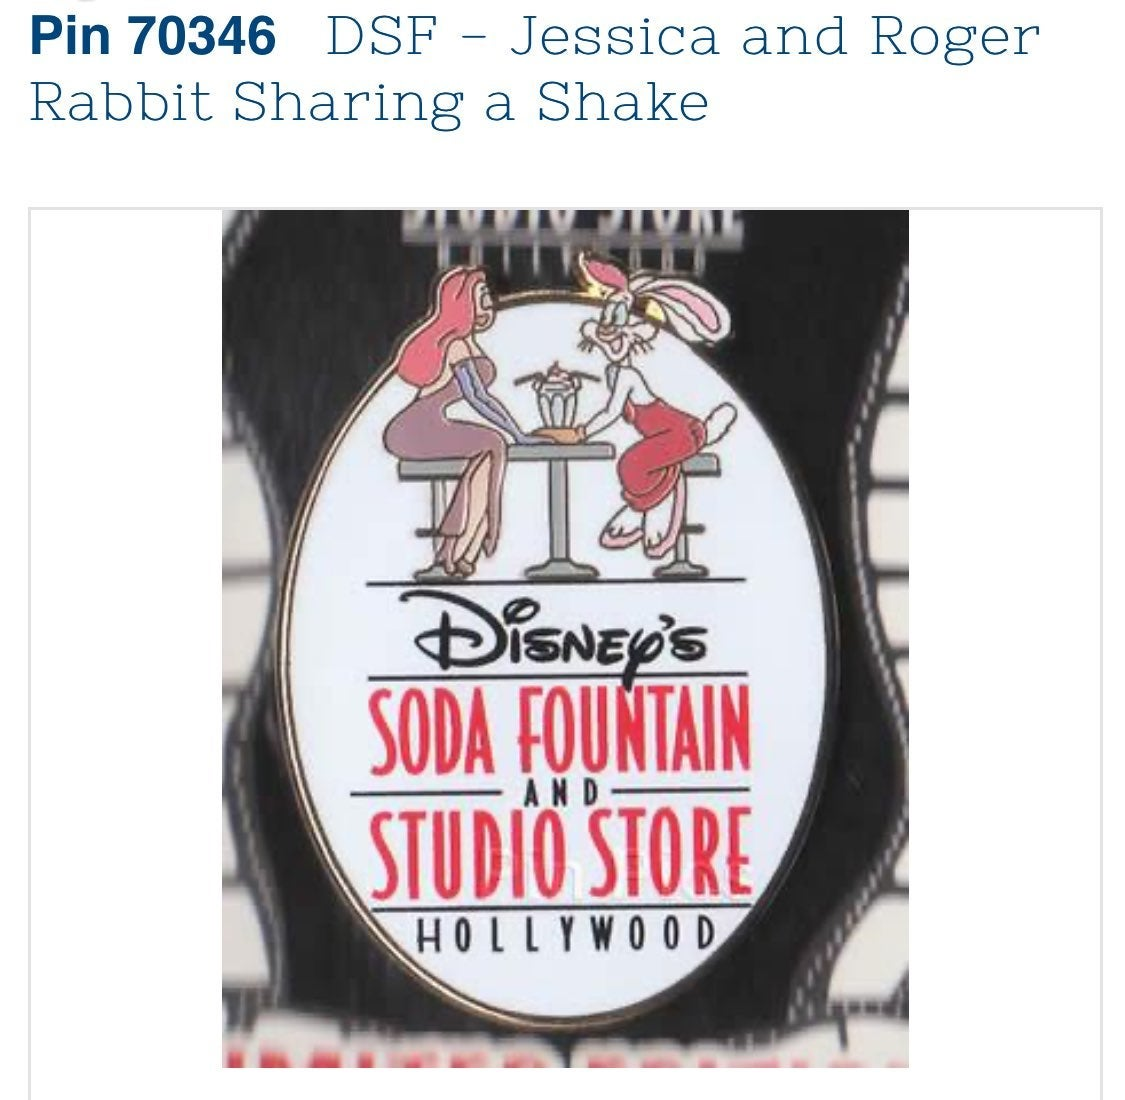 Jessica & Roger Rabbit DSF pin